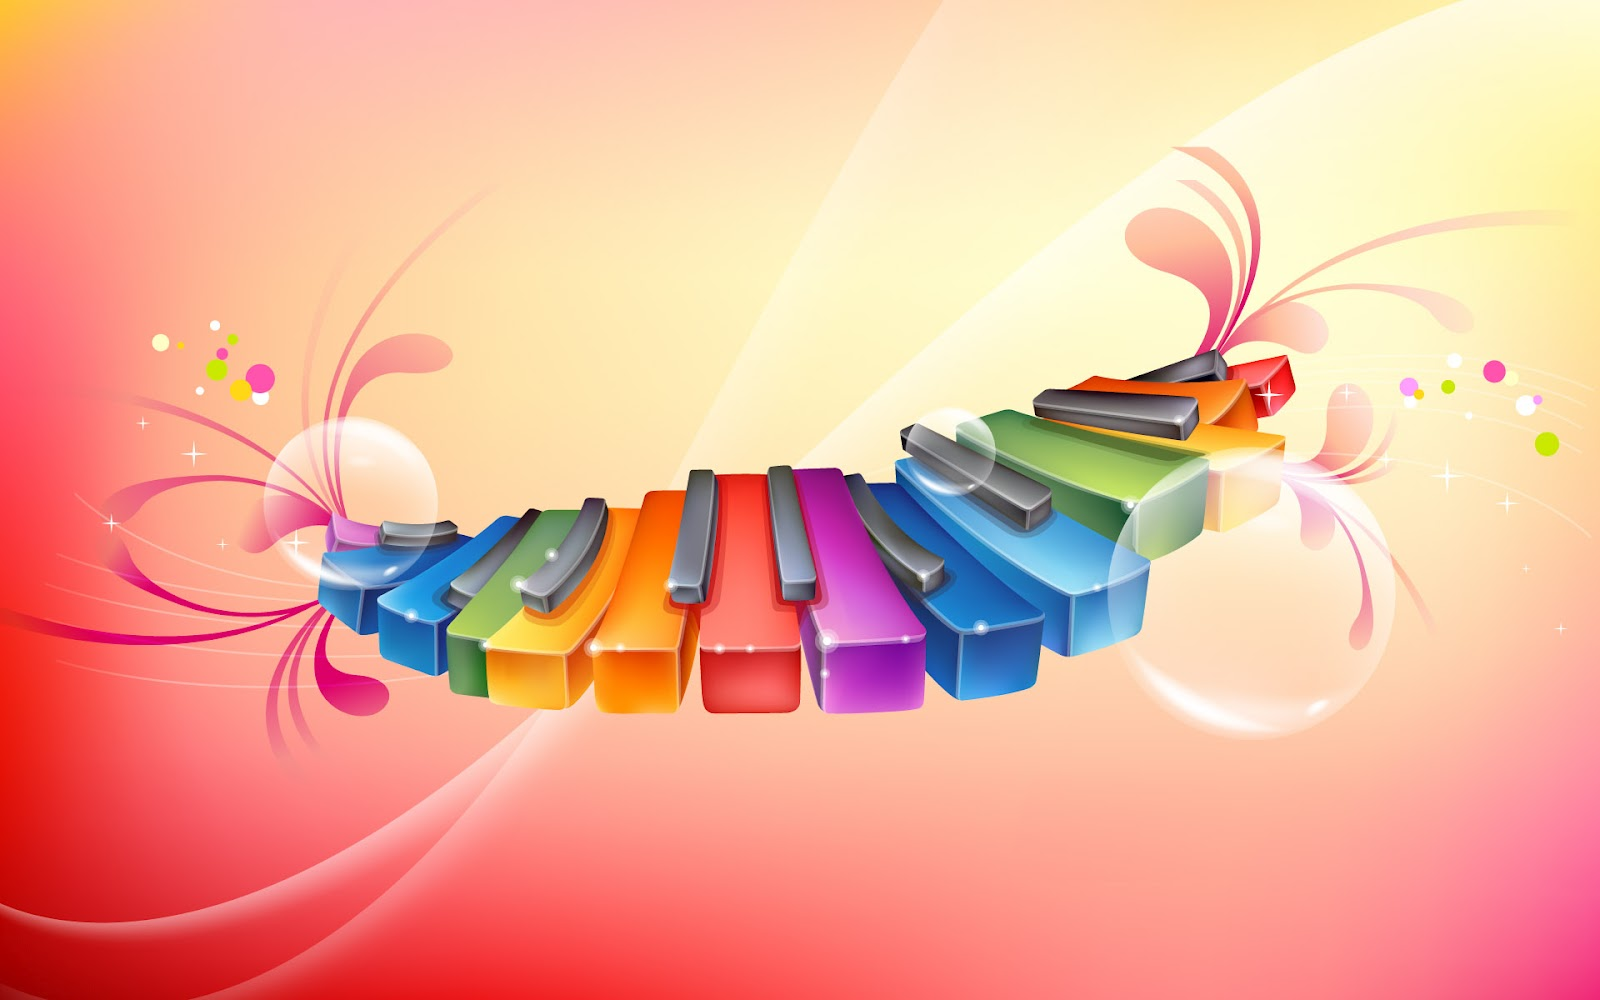 http://3.bp.blogspot.com/-vh_qwv_v1NM/T1A_hzFNnNI/AAAAAAAACcg/kY60aIOYltI/s1600/best-full-colours-Piano-wallpapers-2012.jpg